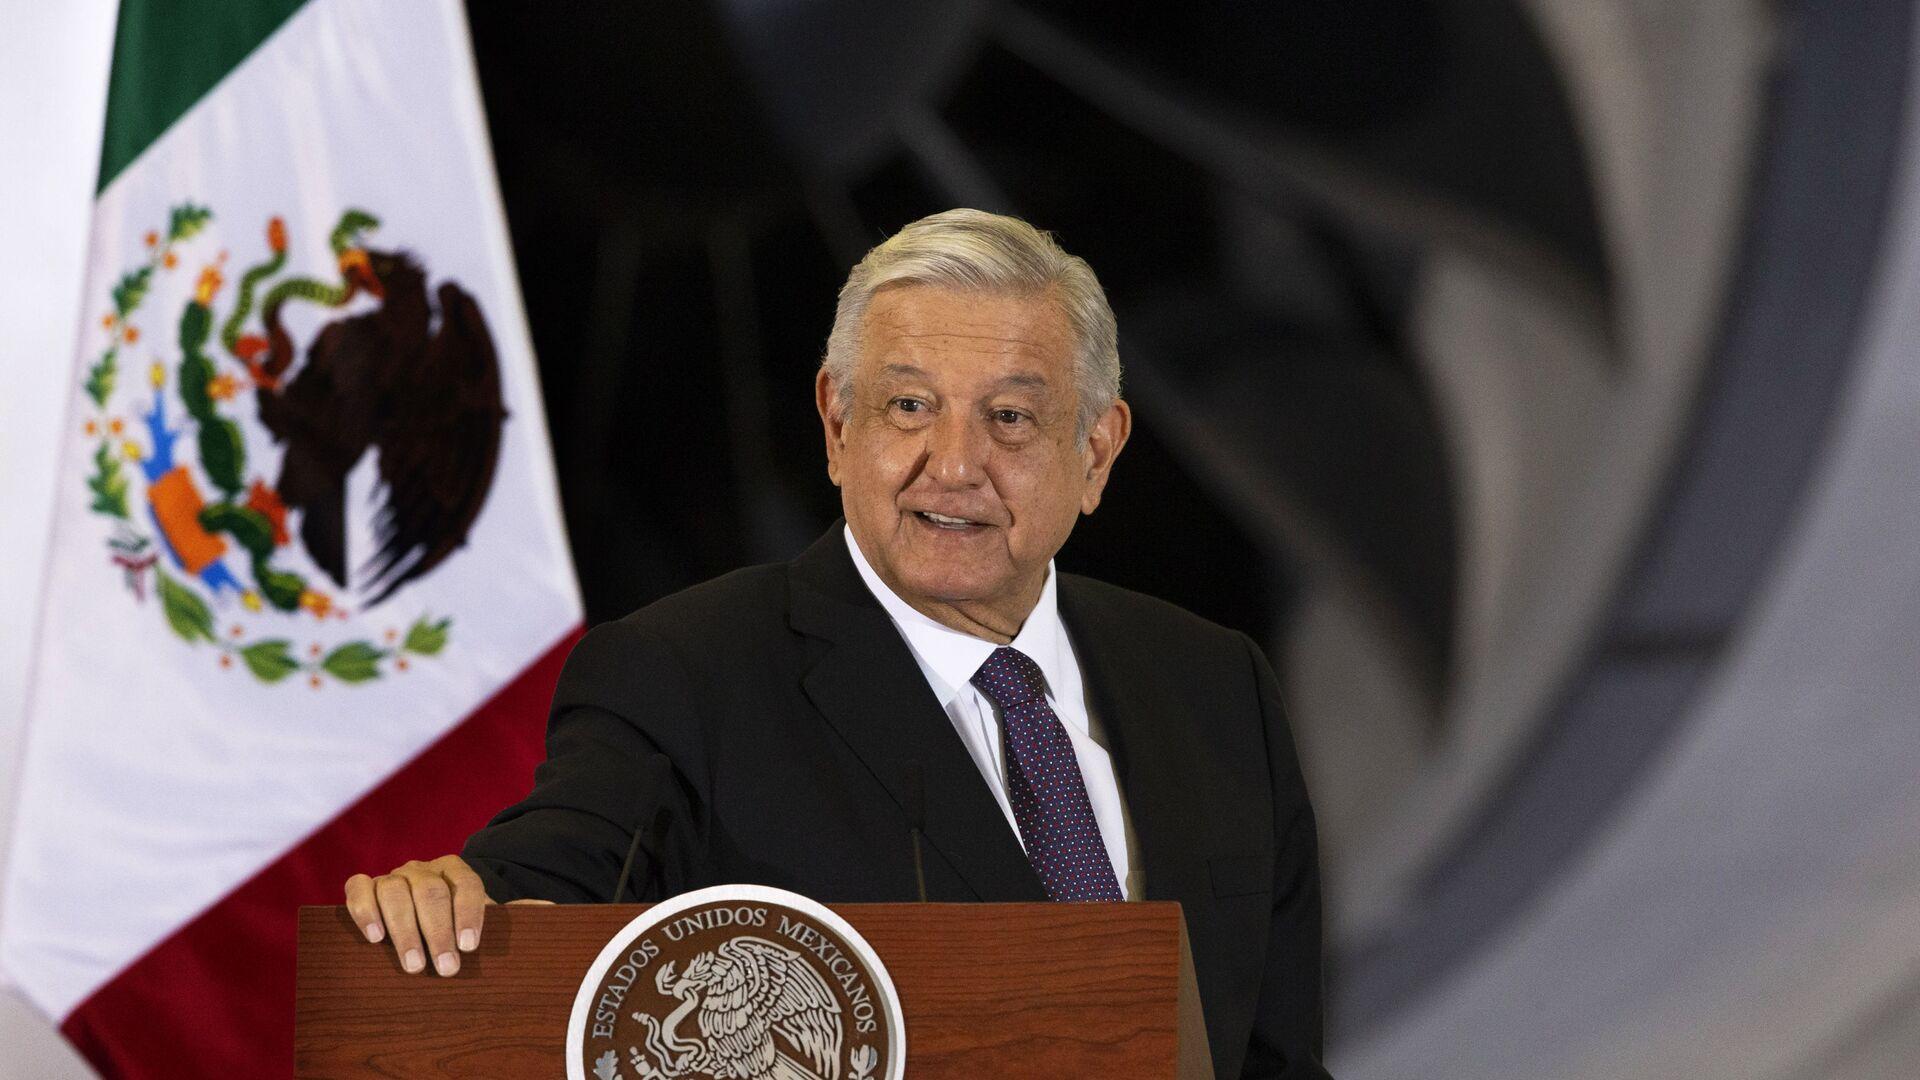 El presidente de México, Andrés Manuel López Obrador - Sputnik Mundo, 1920, 05.02.2021